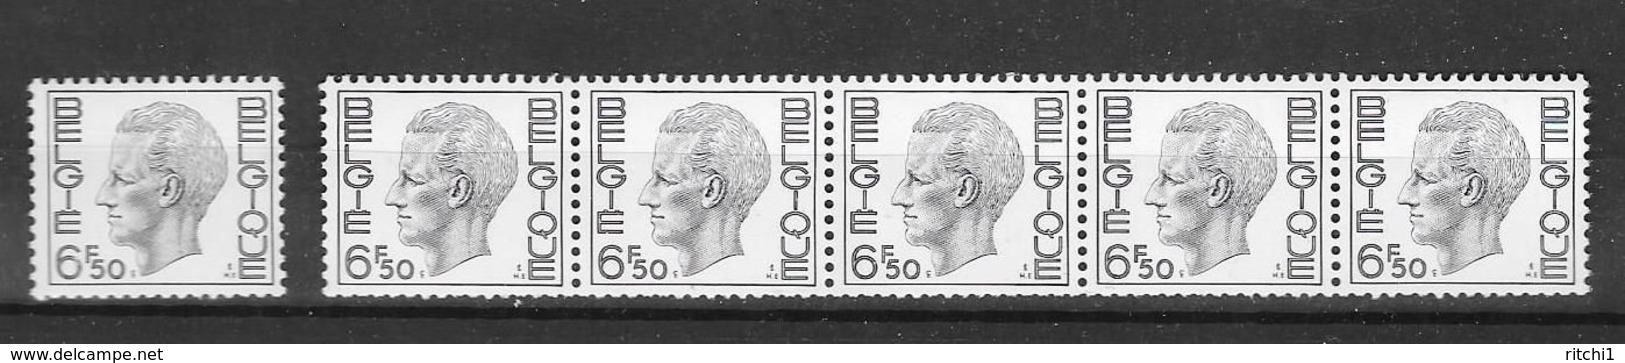 R 57/58 * * Polyv.    Postfris Zonder Scharnier - Coil Stamps